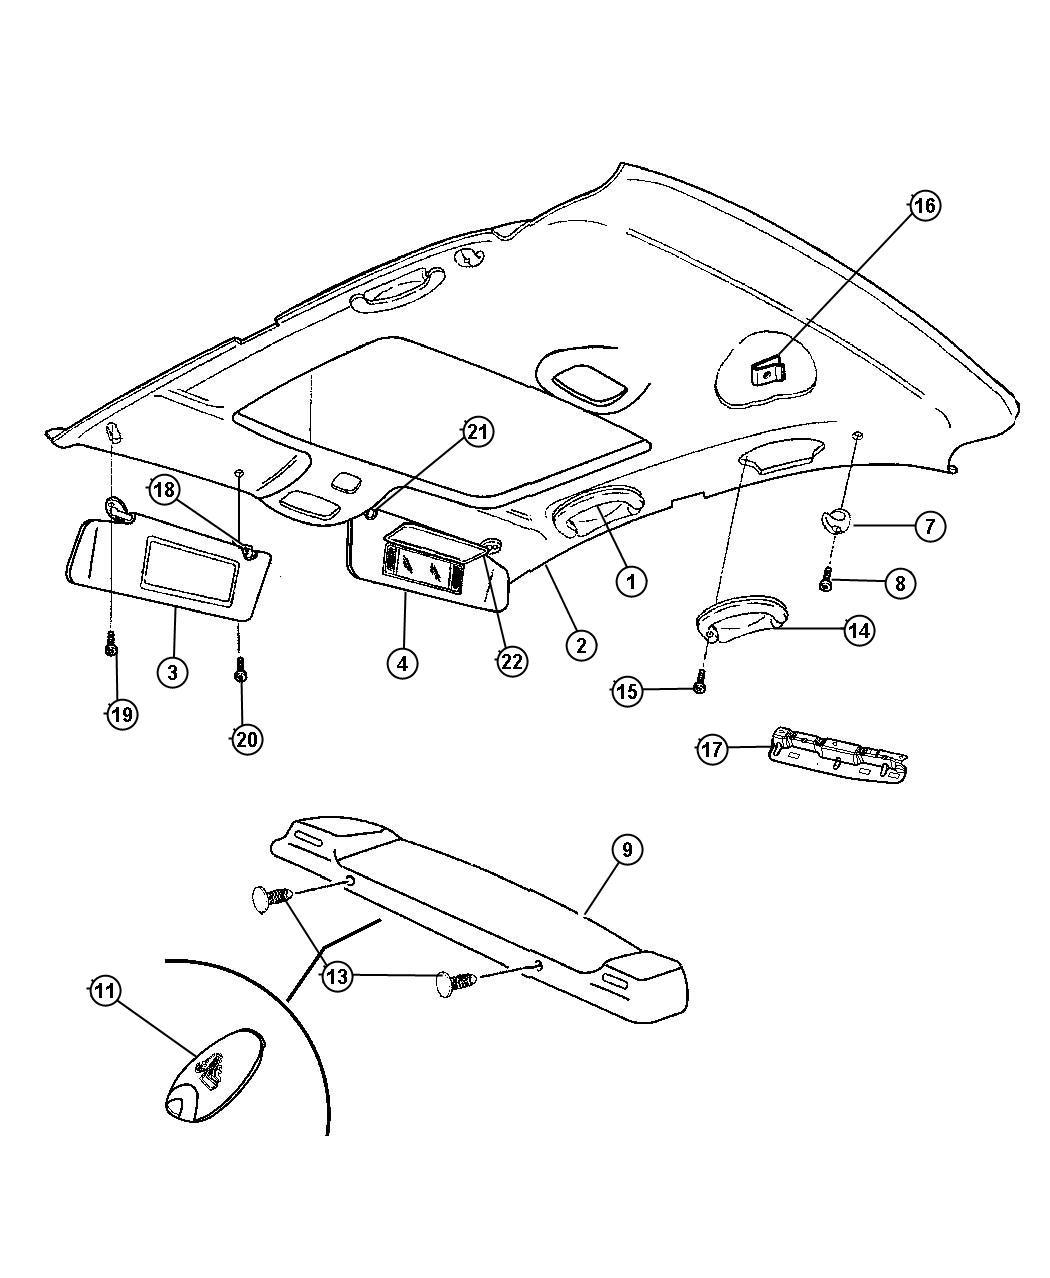 2012 Dodge Charger Panel. Shelf. [l2], [l5]. Trim: [all